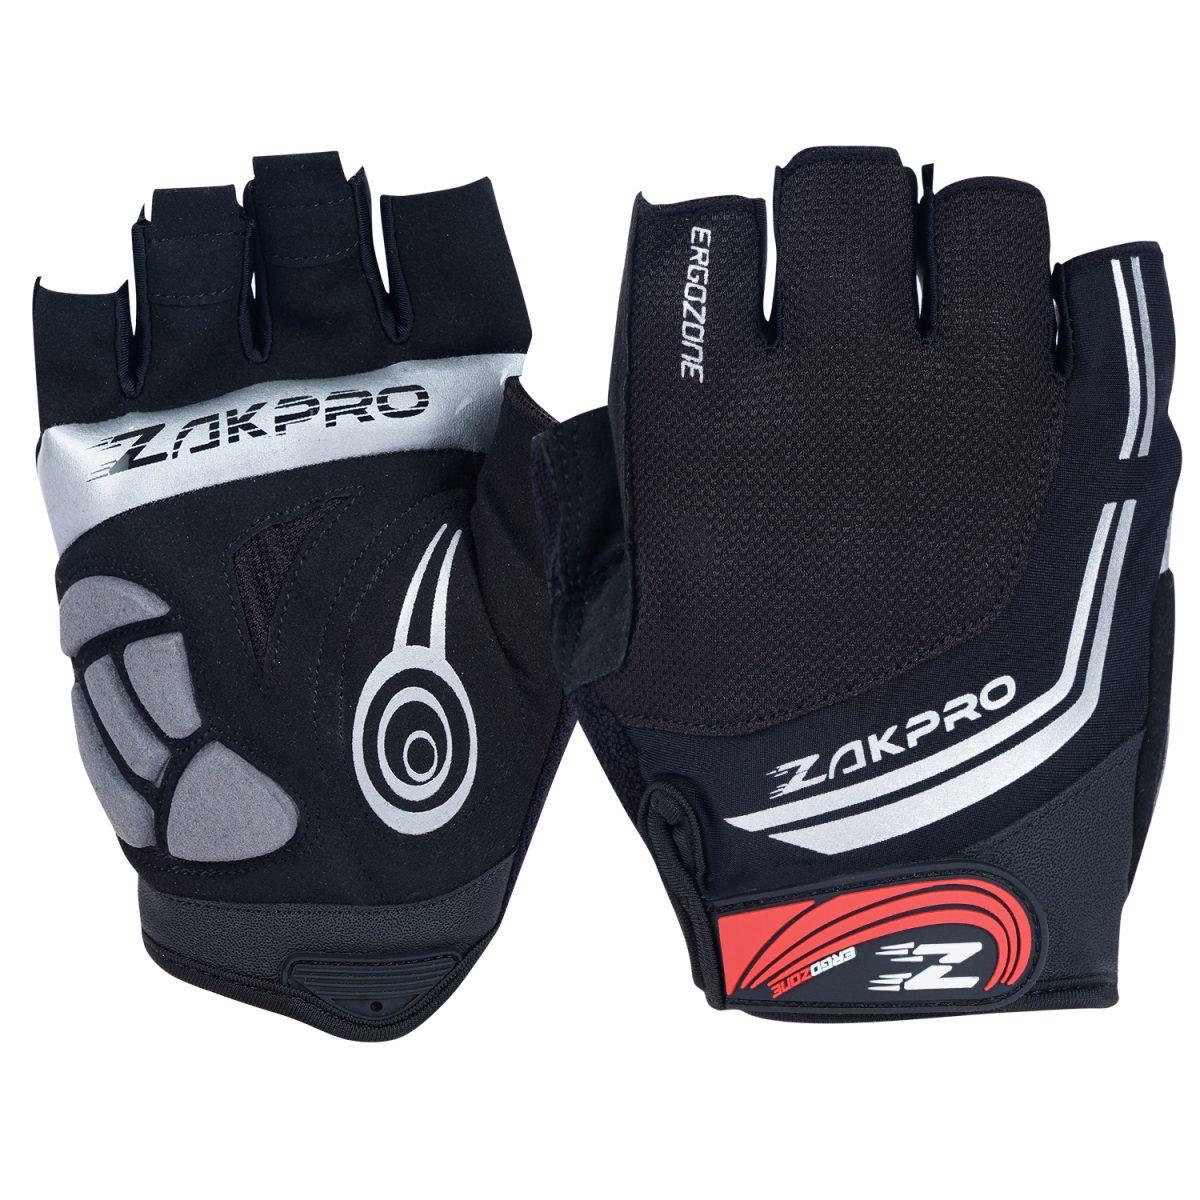 Hybrid Series (Black, ZAK223_Parent)